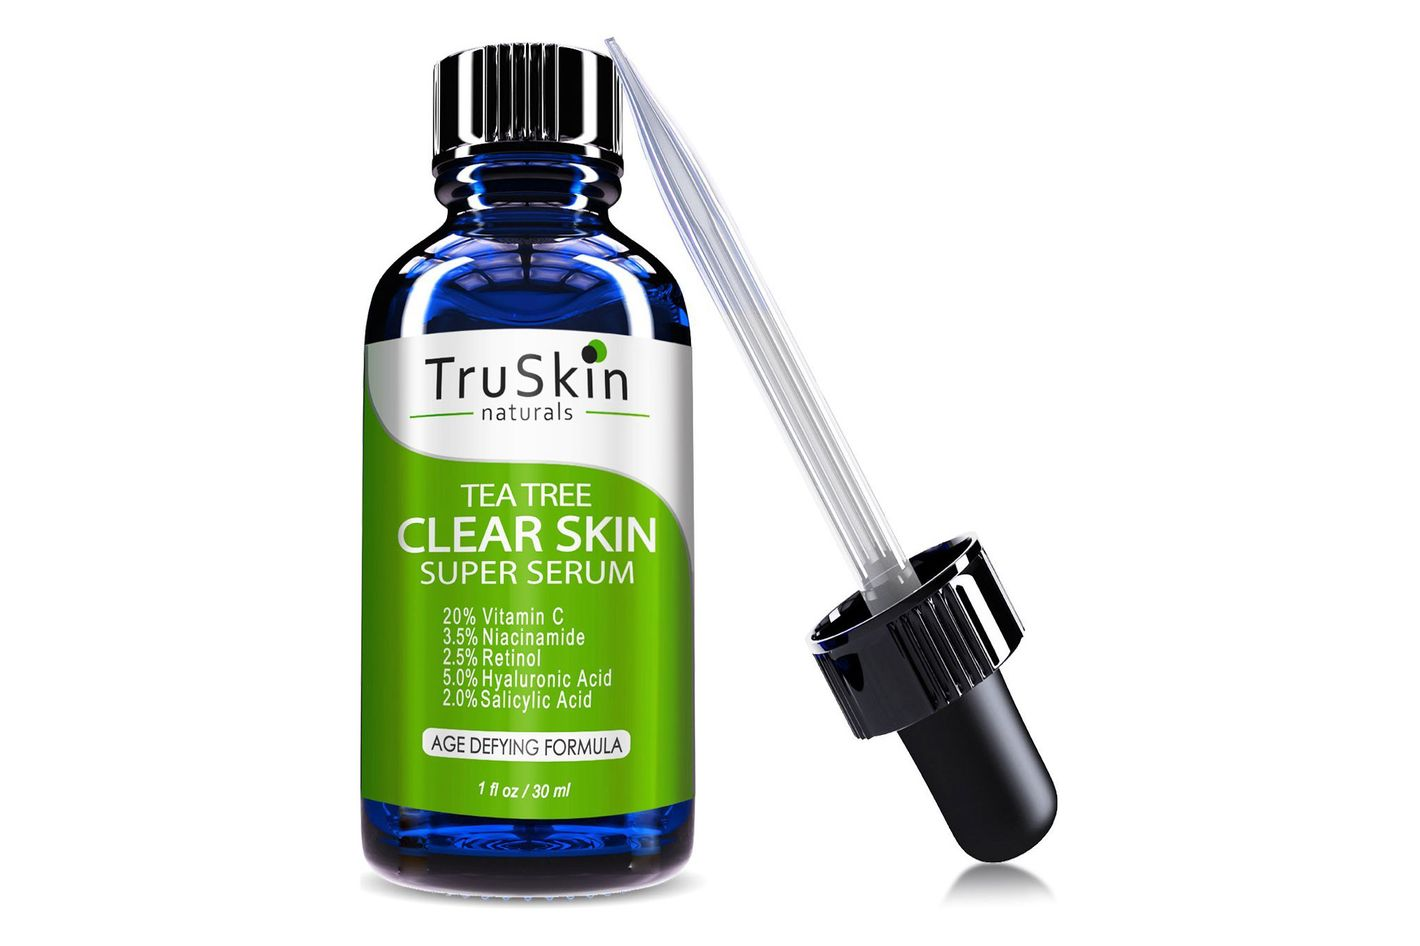 Tea Tree Clear Skin Serum